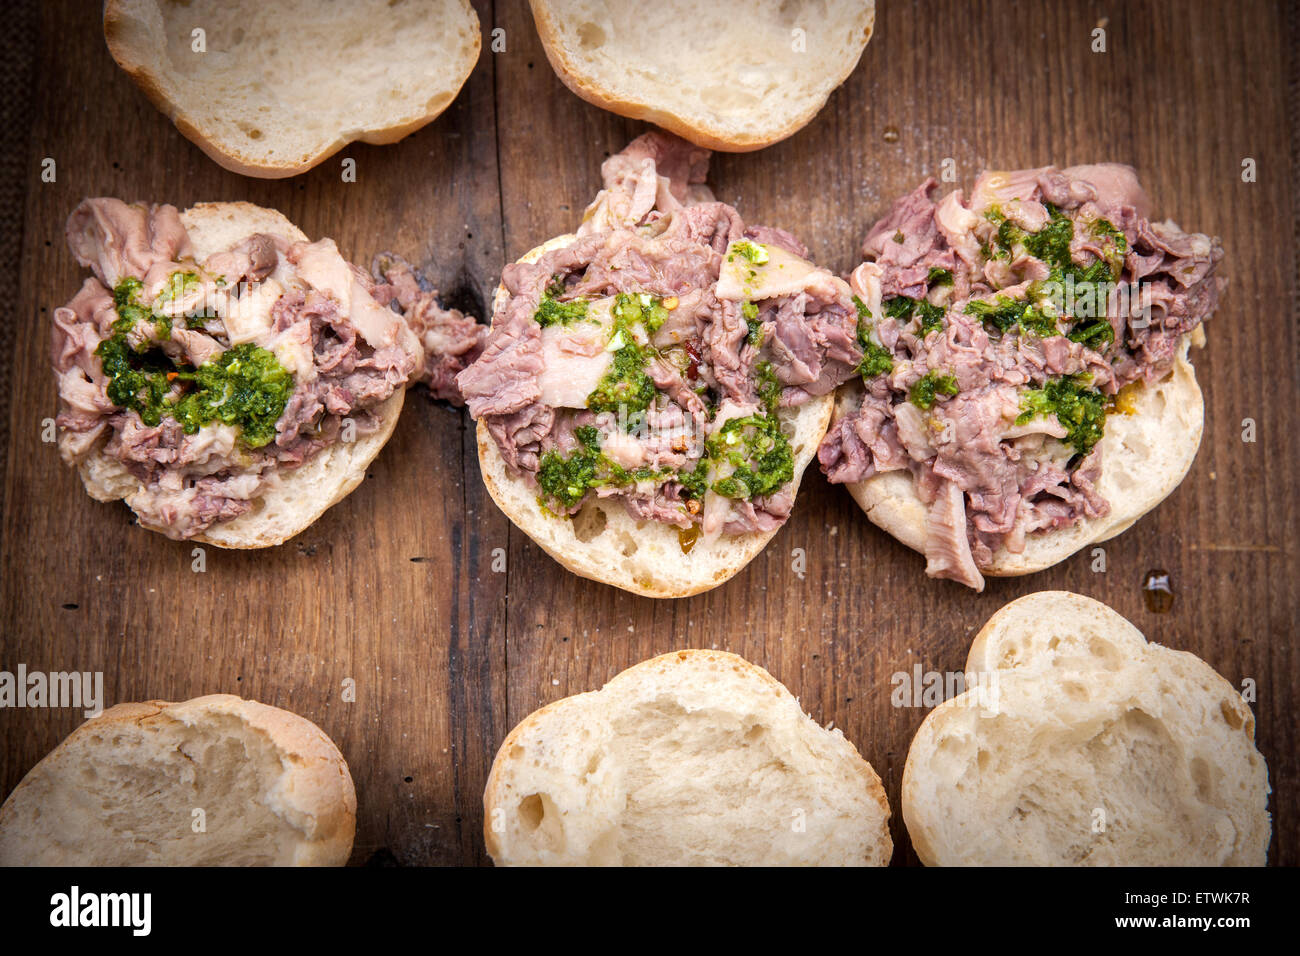 Italian food, sandwich 'Lampredotto' typical Tuscany food - Stock Image